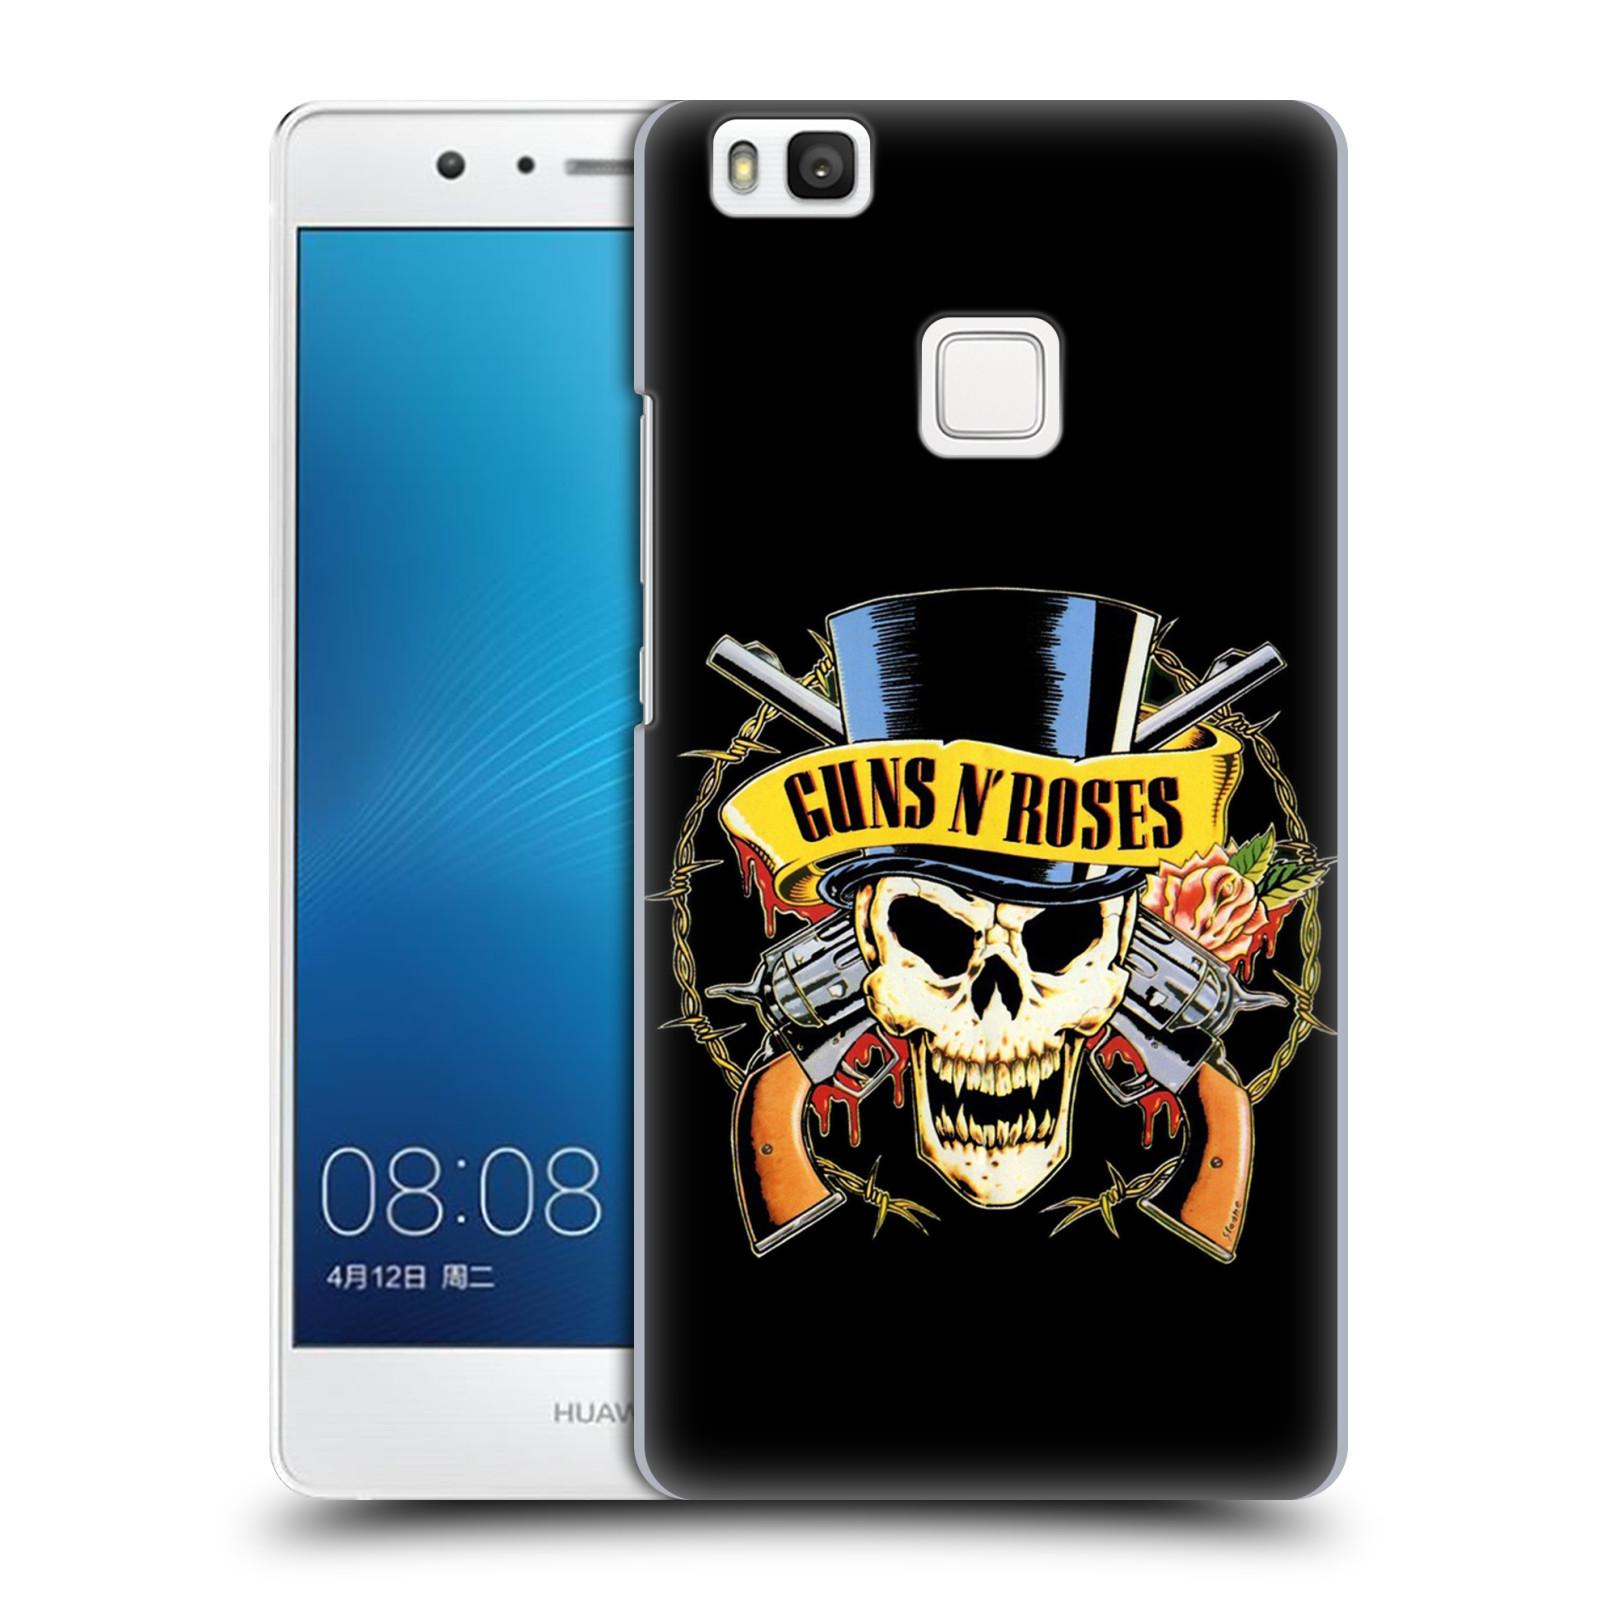 Plastové pouzdro na mobil Huawei P9 Lite HEAD CASE Guns N' Roses - Lebka